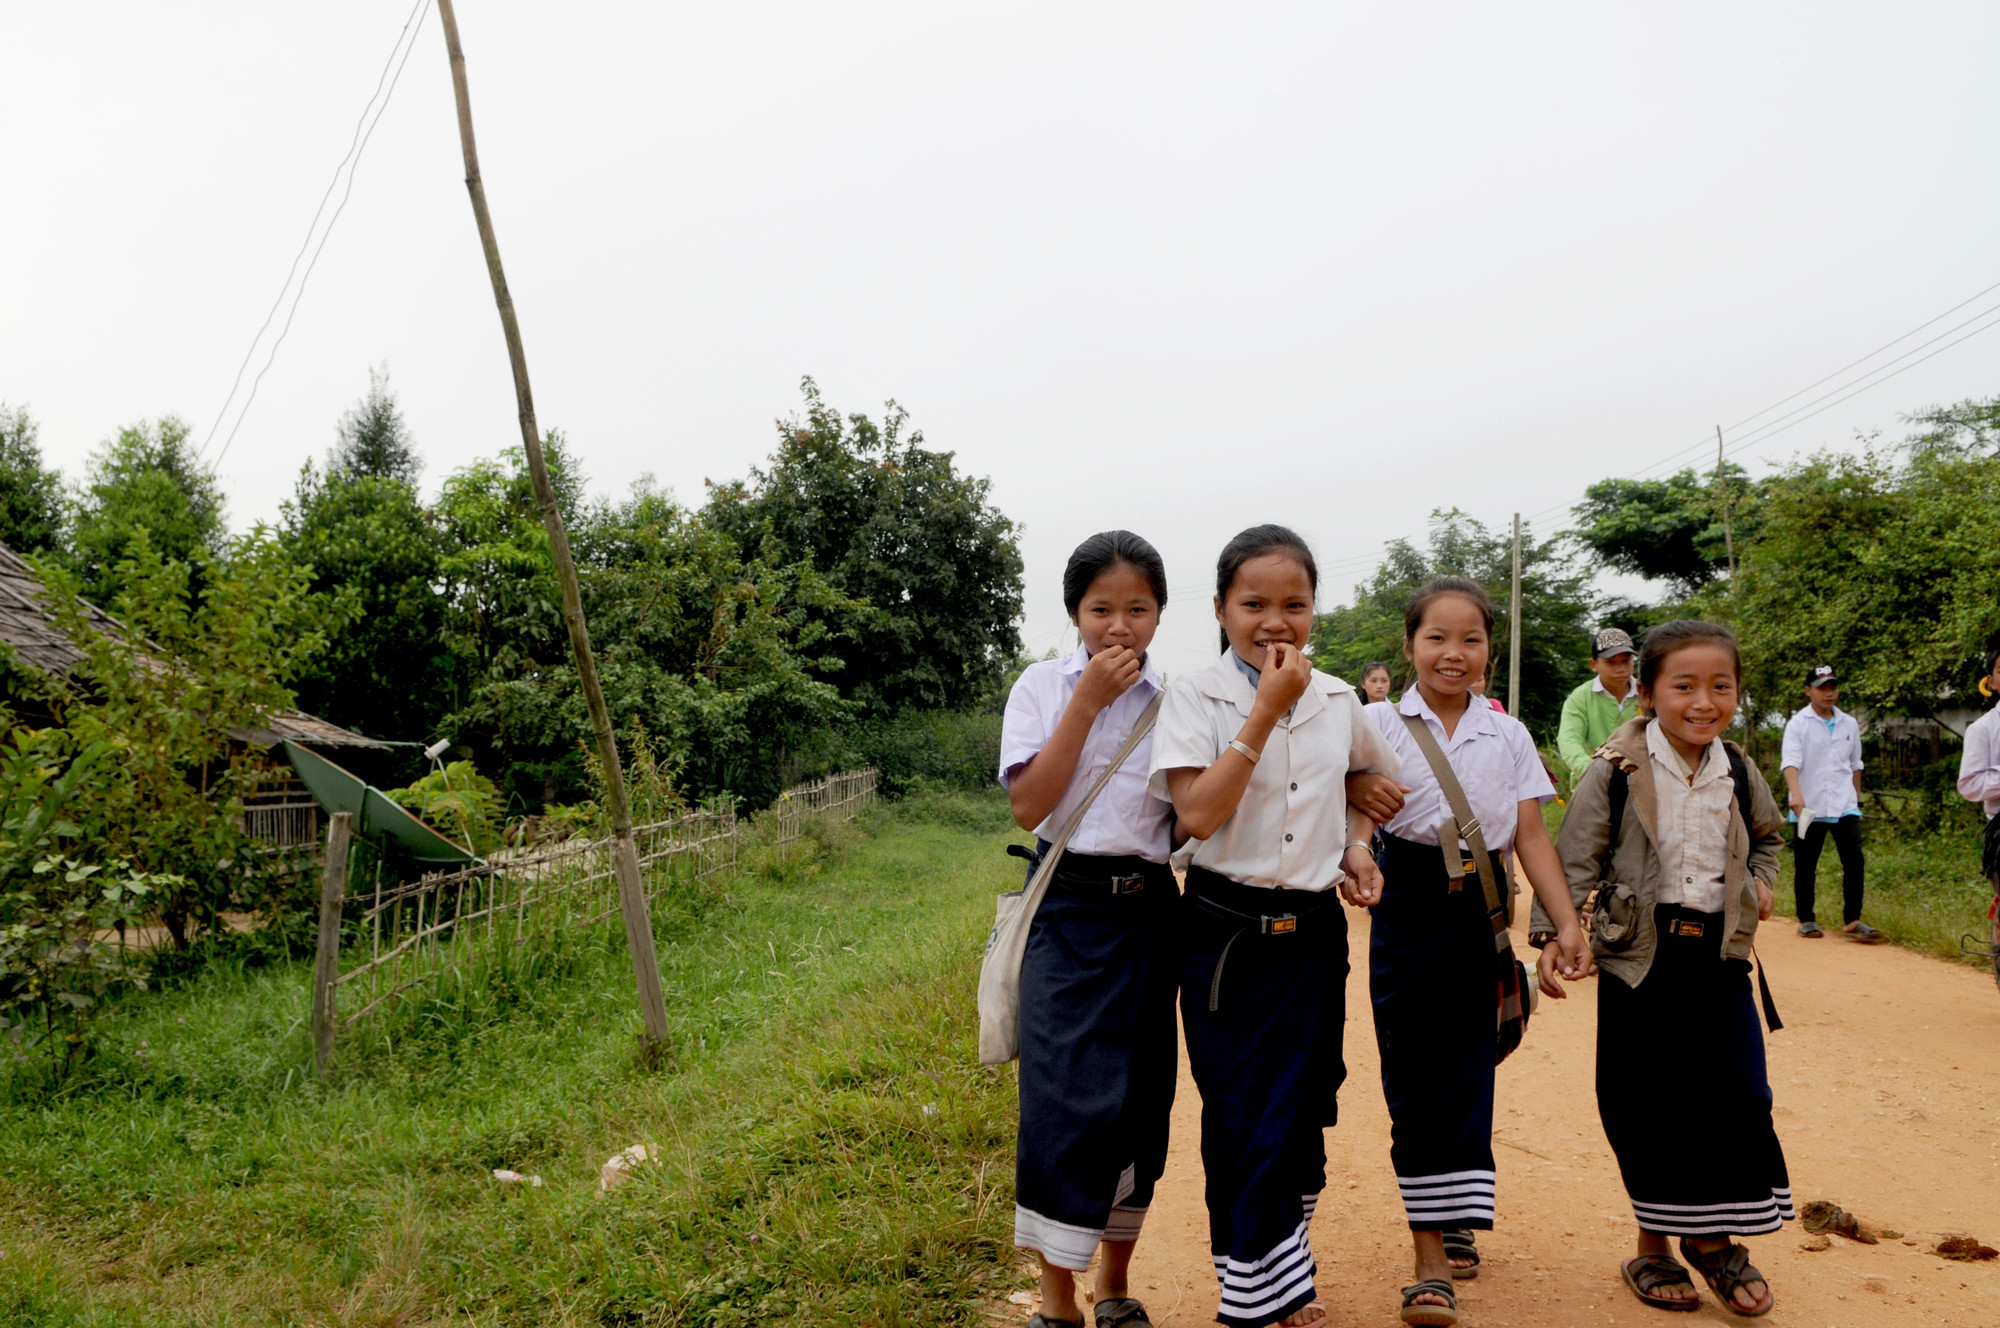 【JS】女子小学生 高学年画像スレPart24【JS】 [転載禁止]©bbspink.comYouTube動画>3本 ->画像>207枚